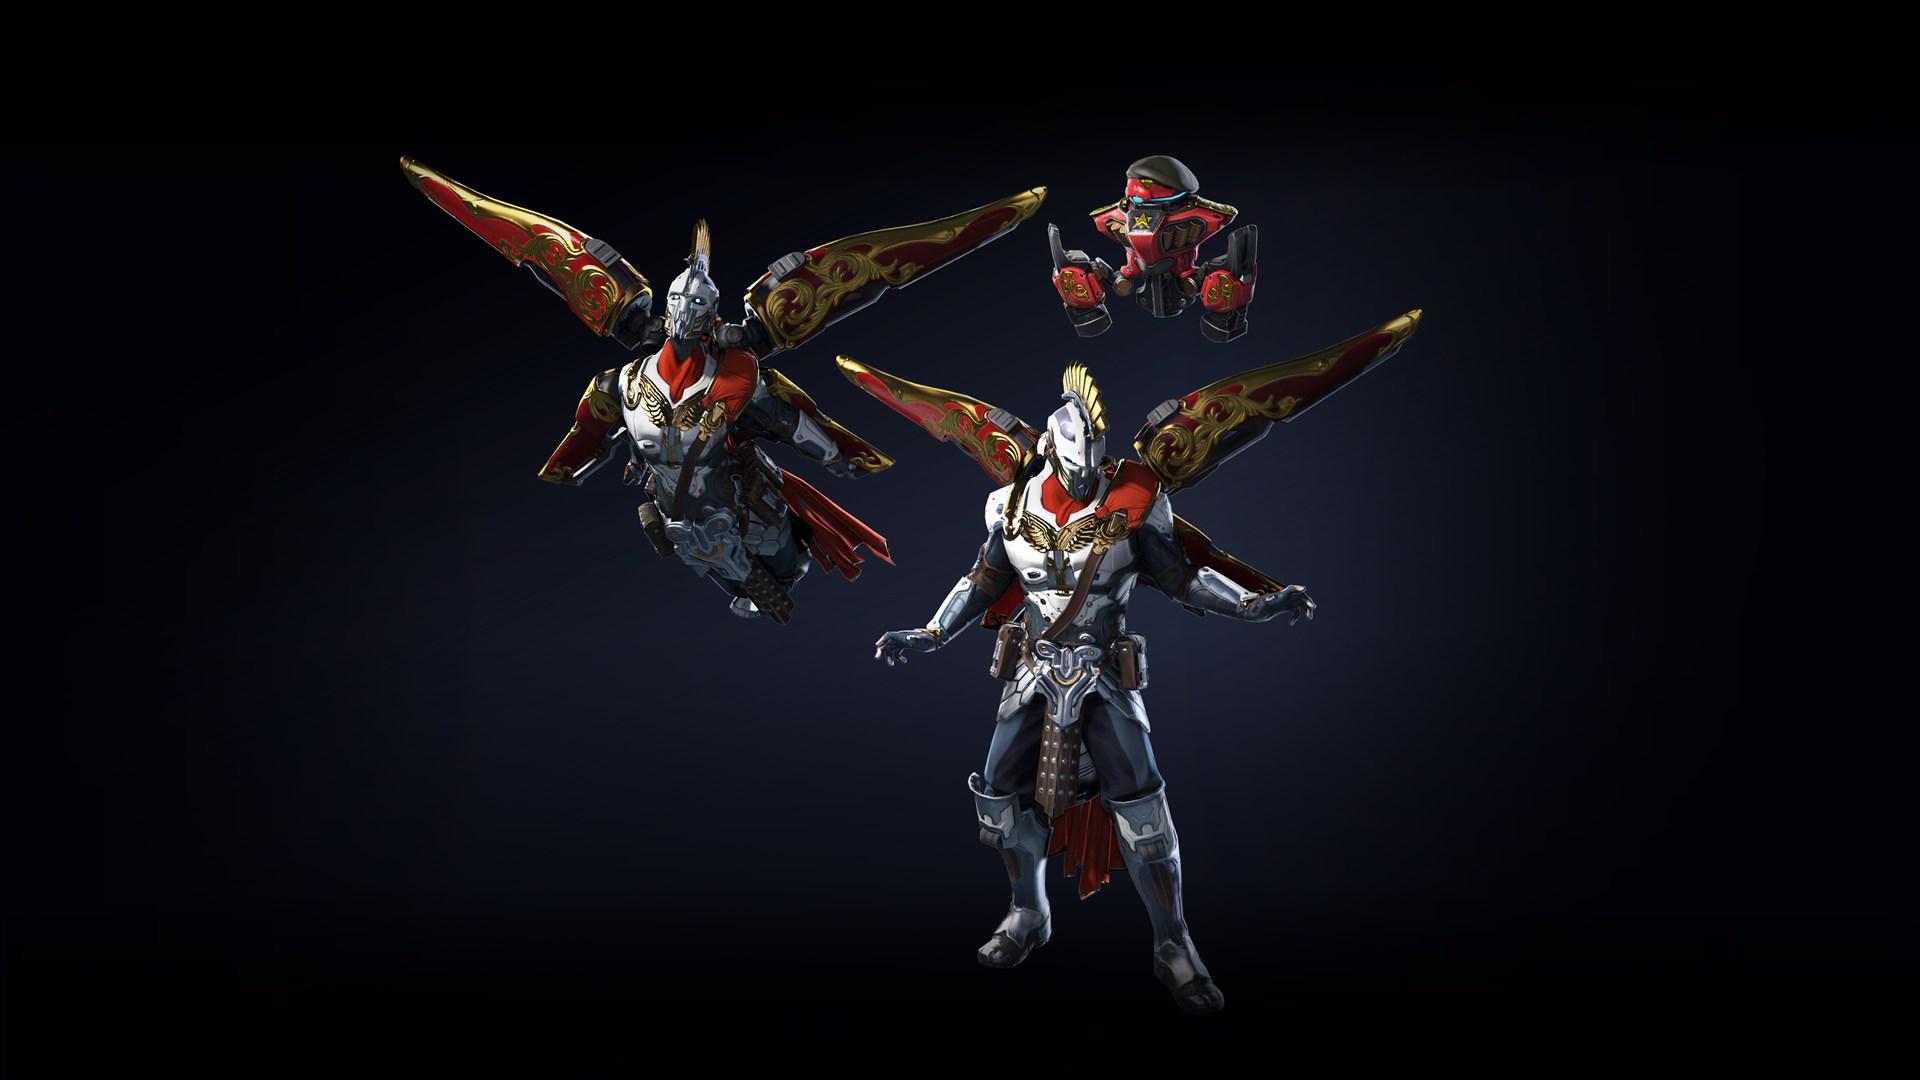 Skyforge : Pack Gloire et honneur